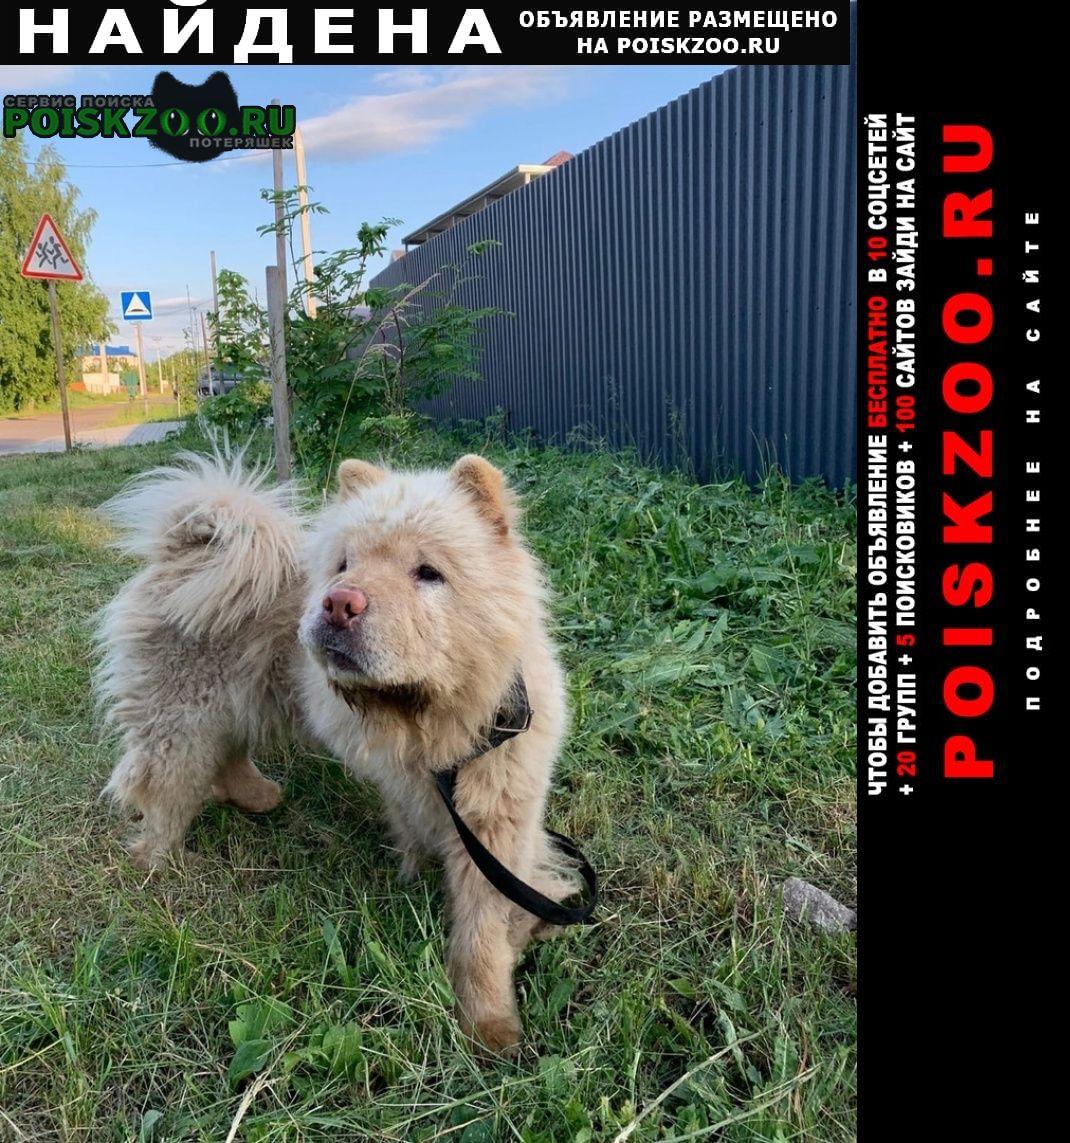 Найдена собака кобель порода чау-чау Лаишево